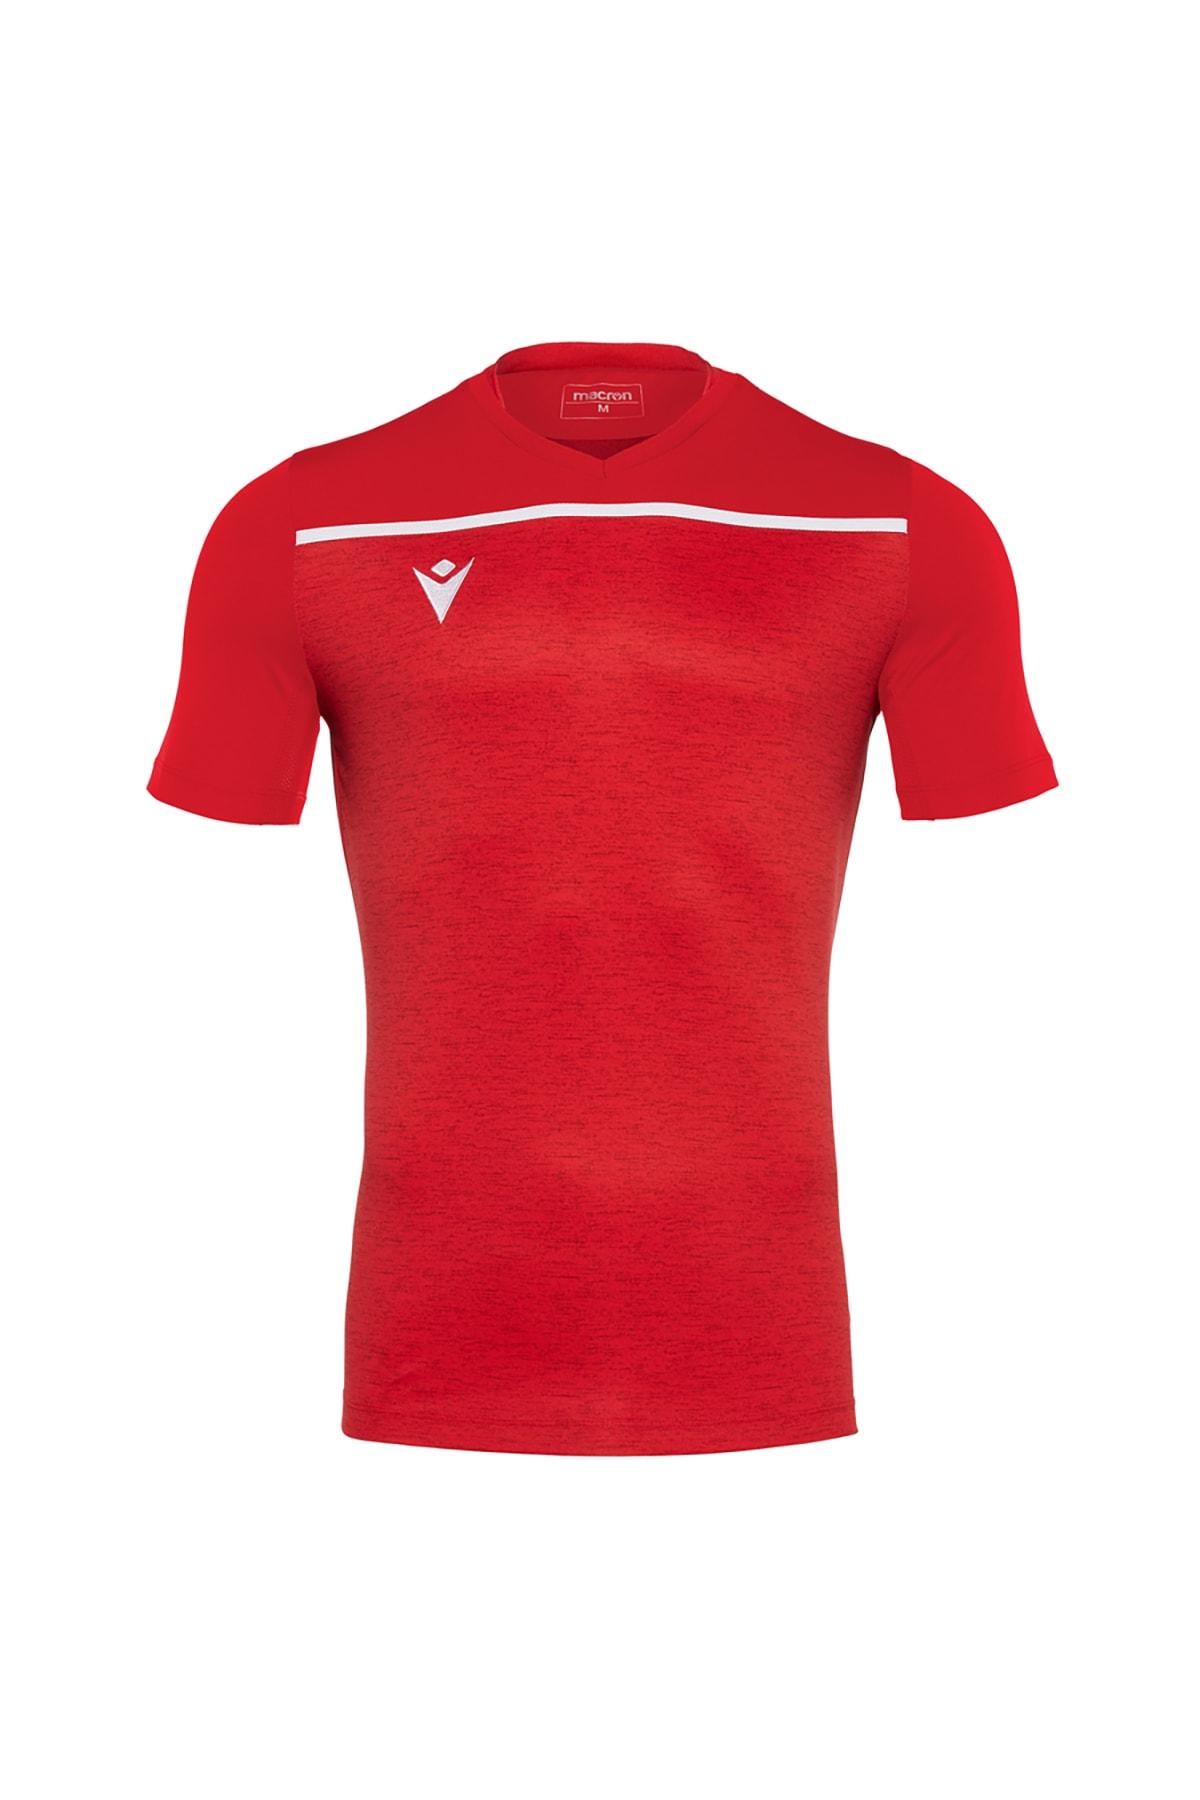 bilcee Macron Kırmızı T-shirt 50630201 1